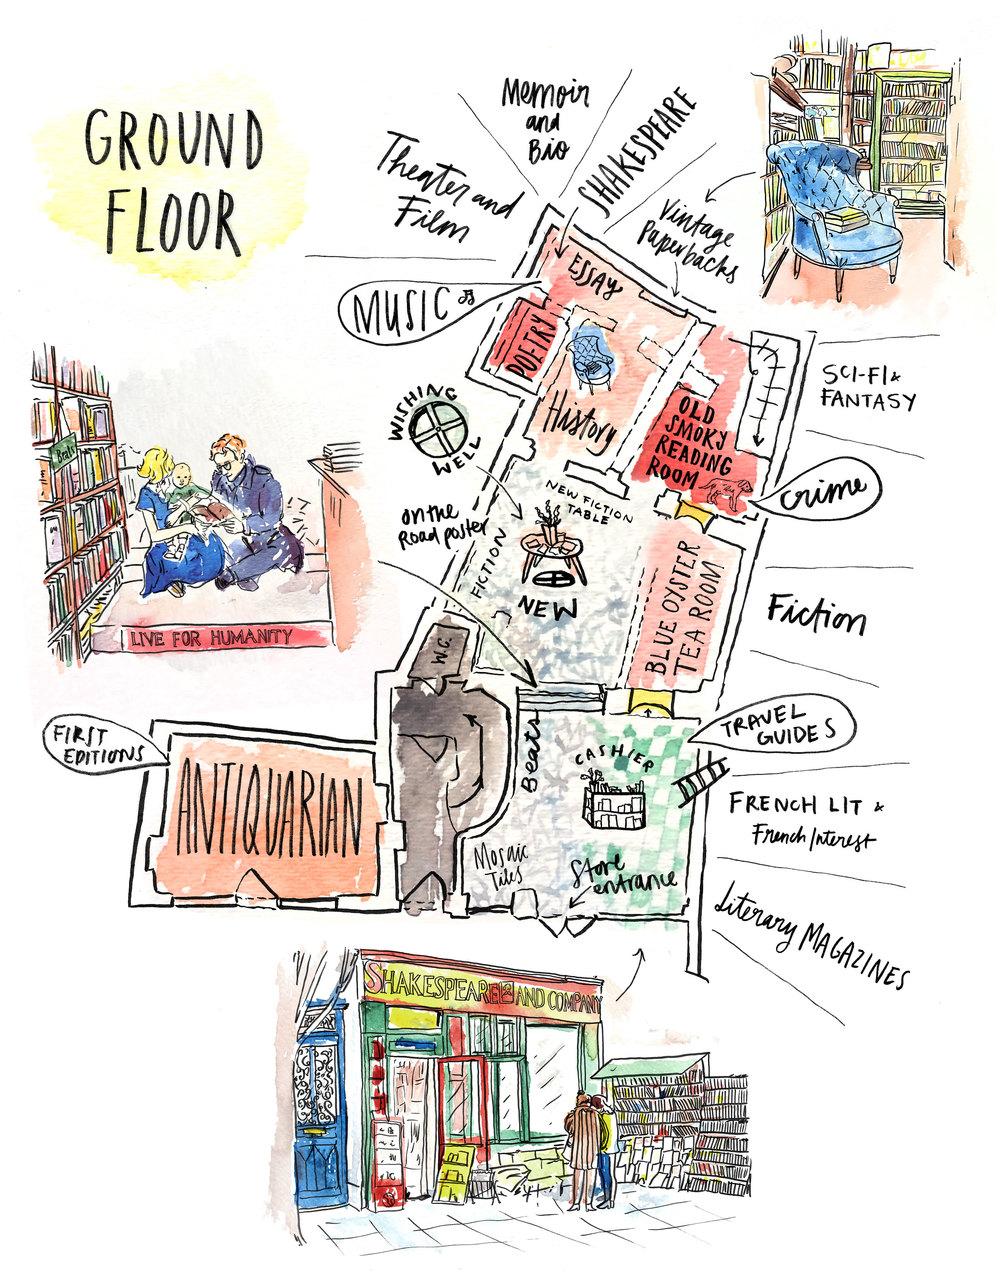 Shakespeares-groundfloor-floorplan.jpg